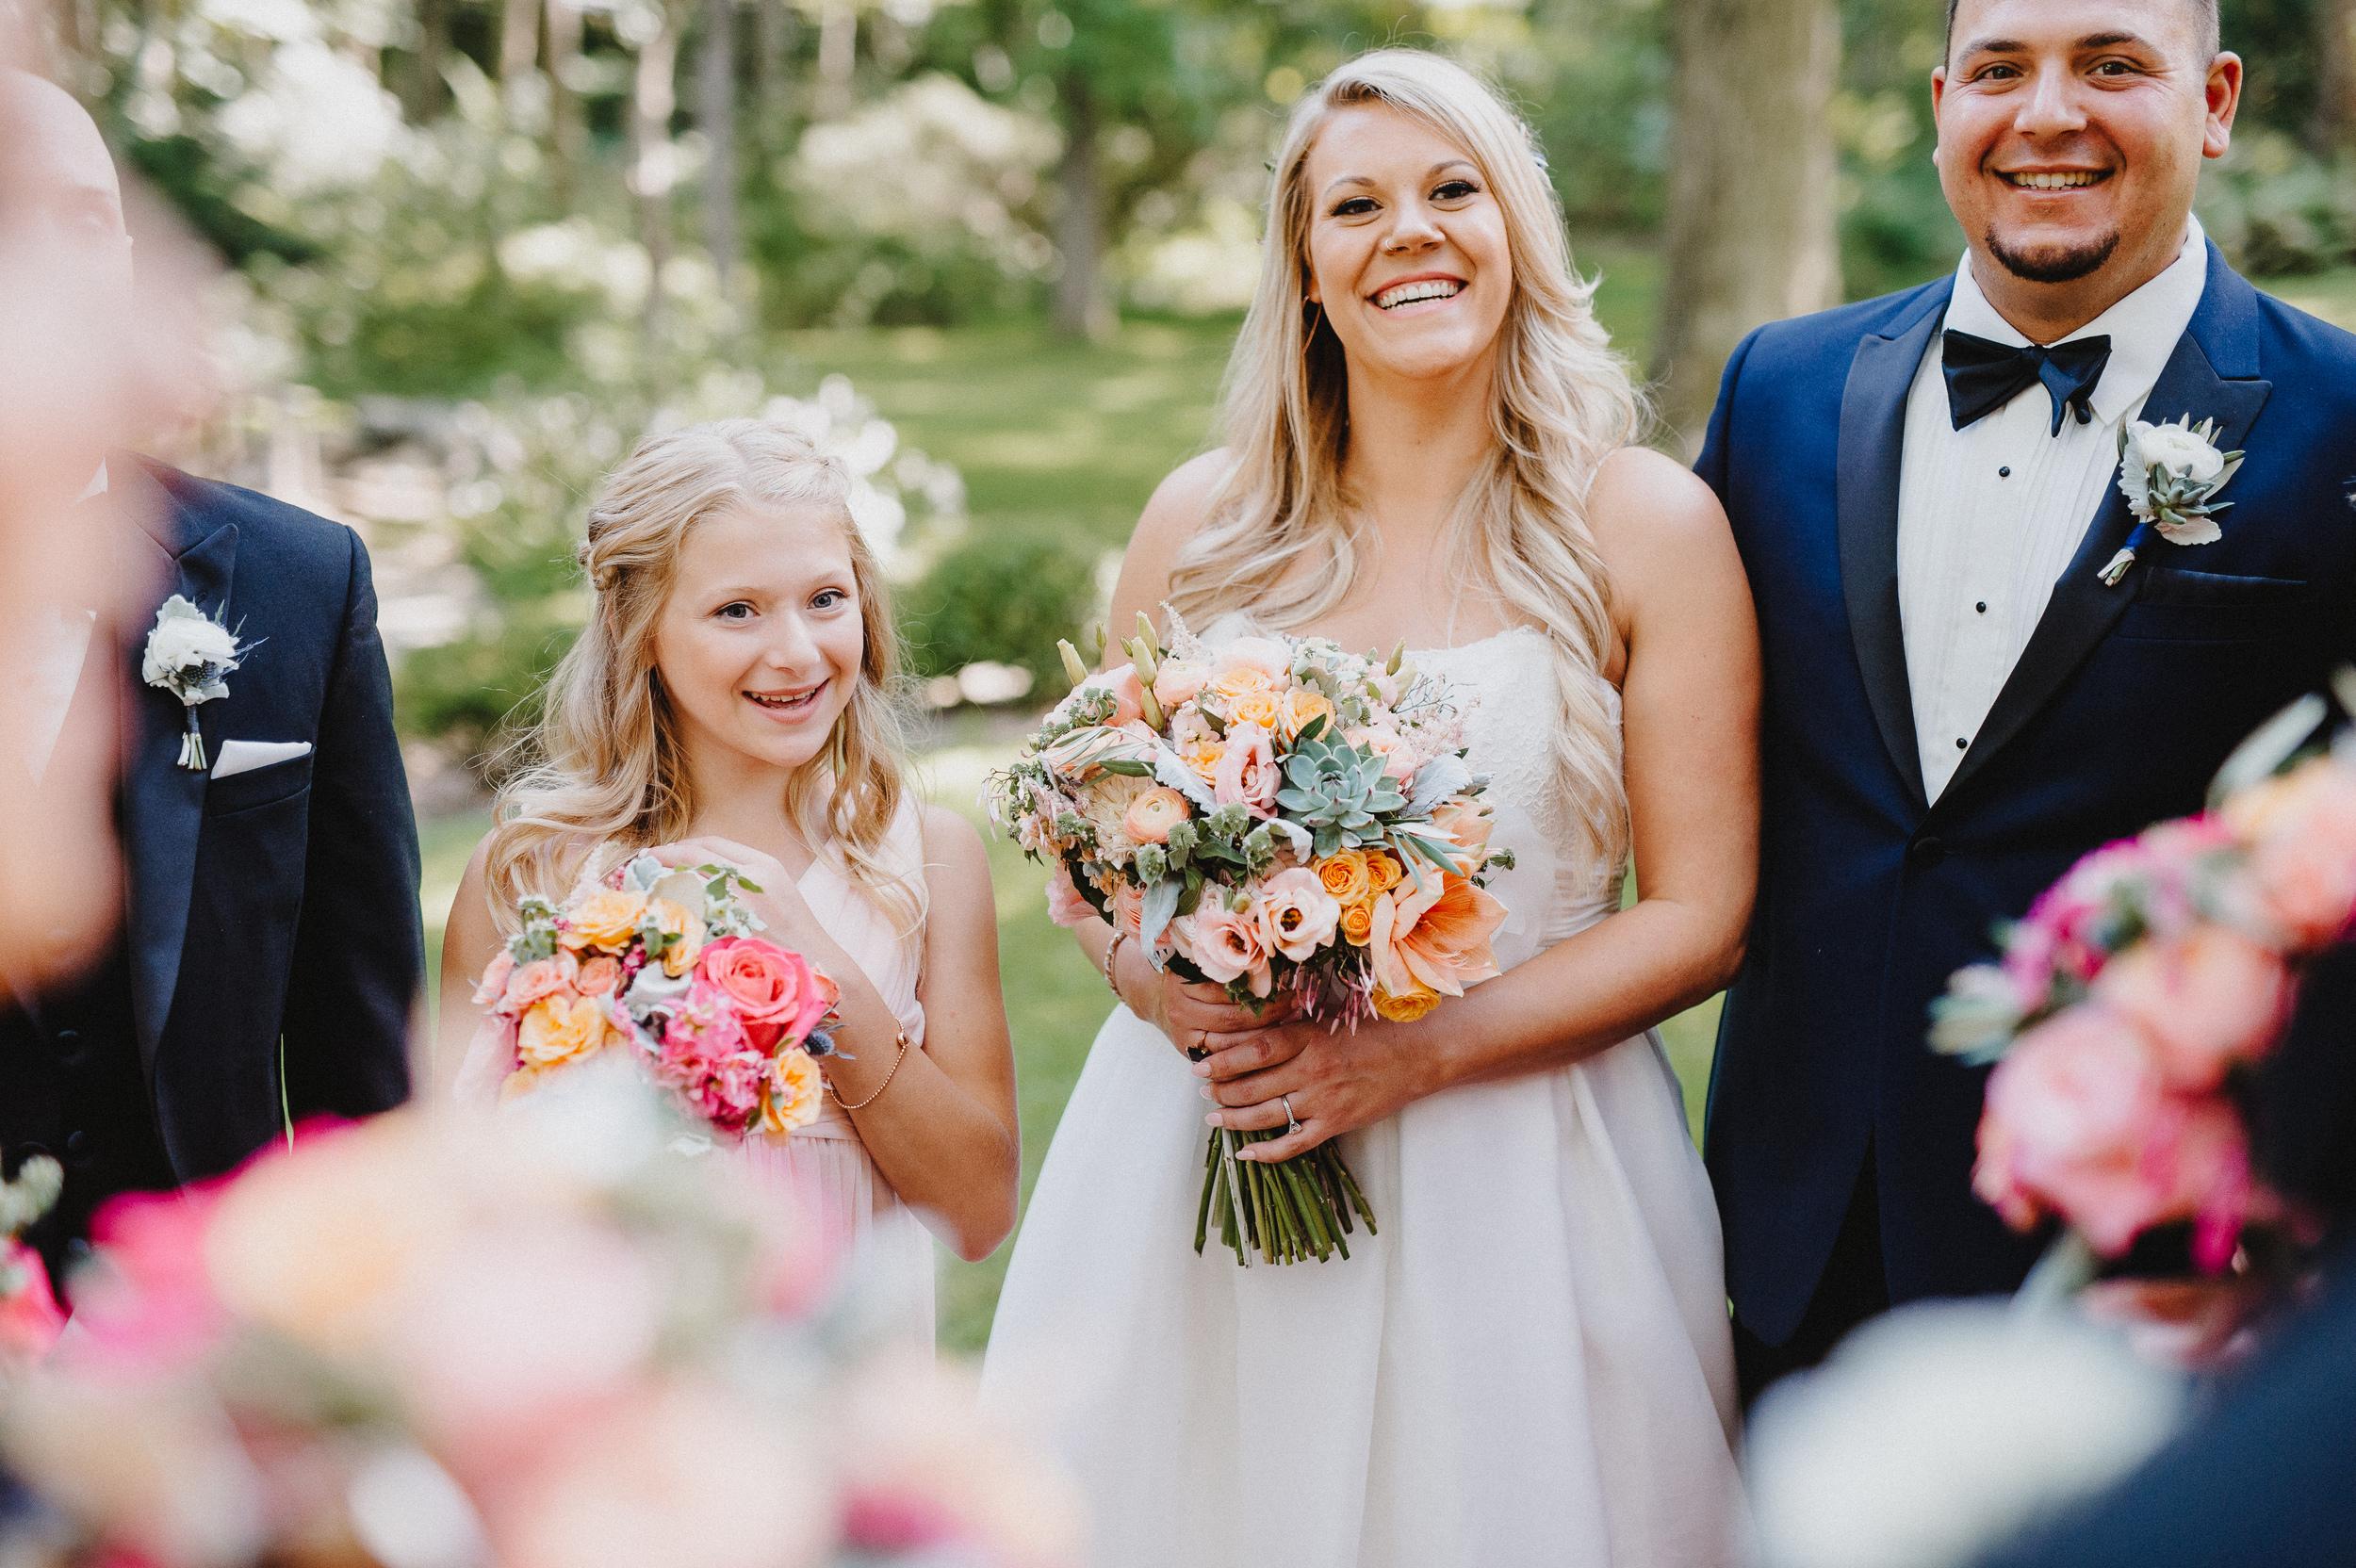 holly-hedge-estate-wedding-photographer-pat-robinson-photography-30.jpg